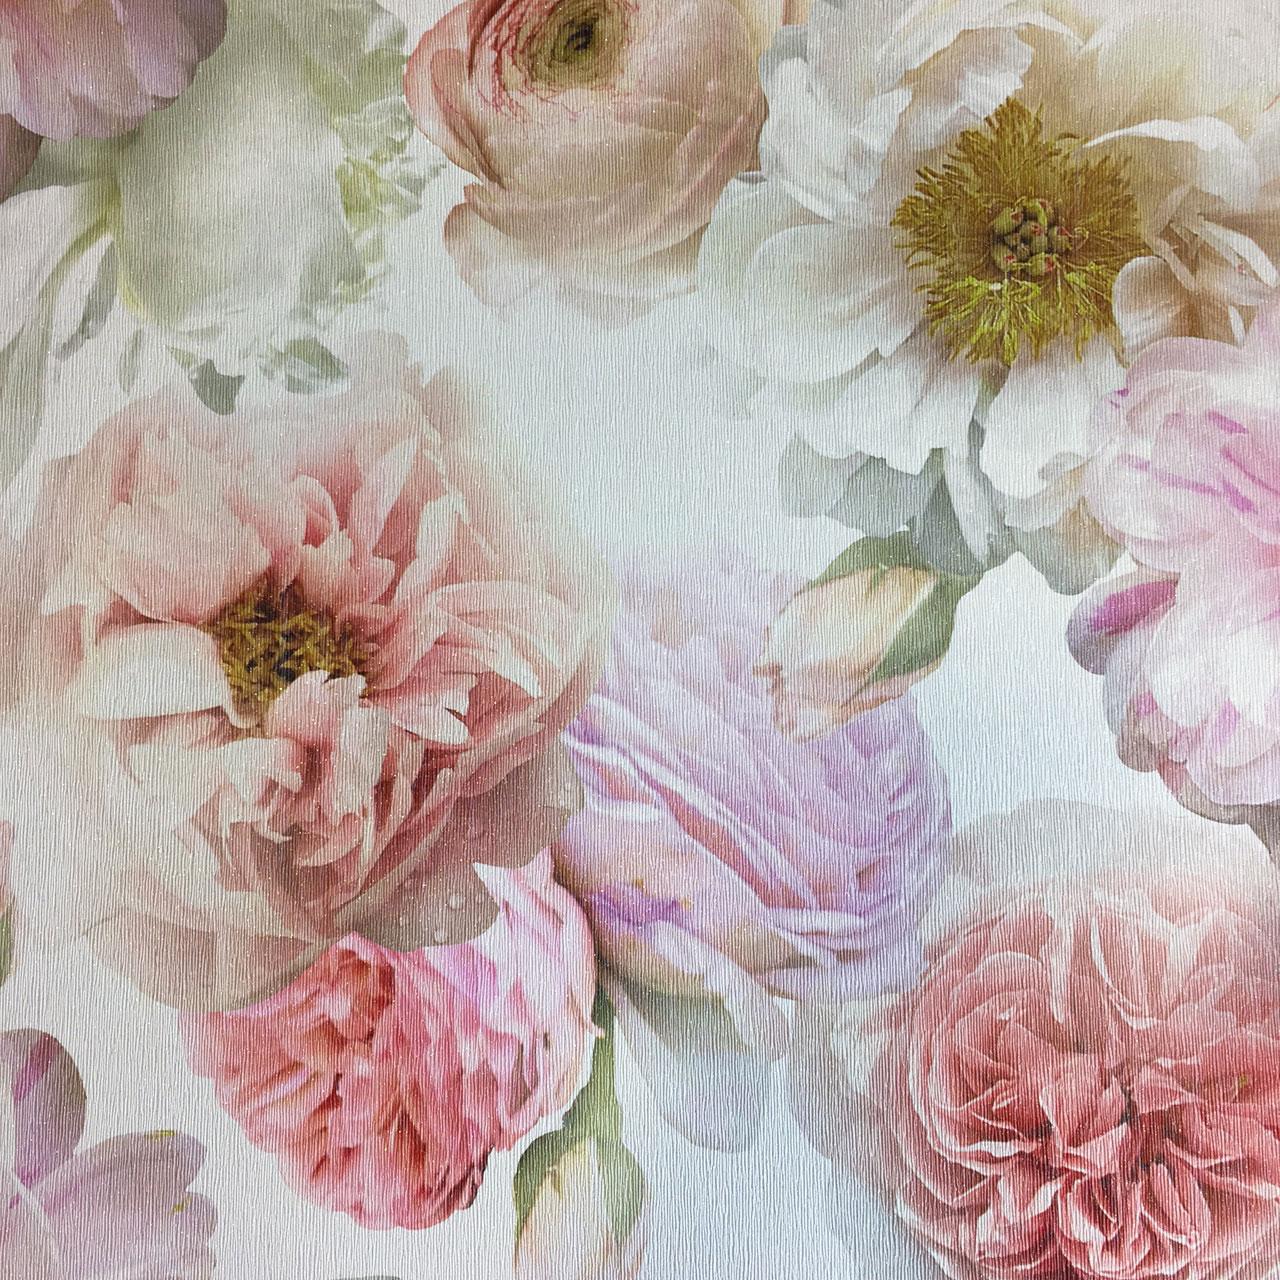 Floral Wallpaper Flowers Glitter Luxury Textured Vinyl Diamond